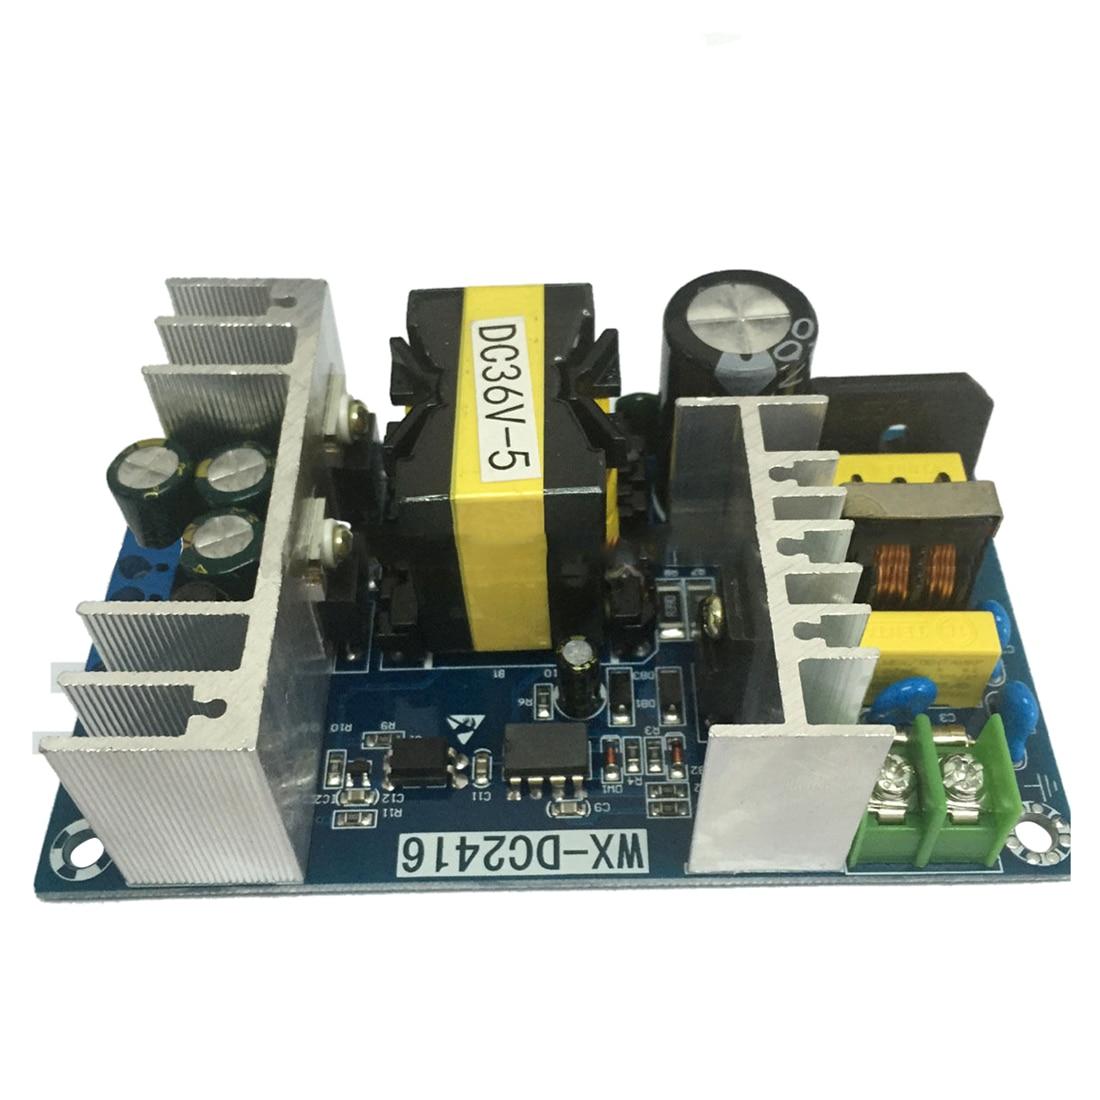 AC-DC Inverter Module 110V 220V 100-265V to 36V 5A Adapter Switching Power Supply мультиметр uyigao ac dc ua18